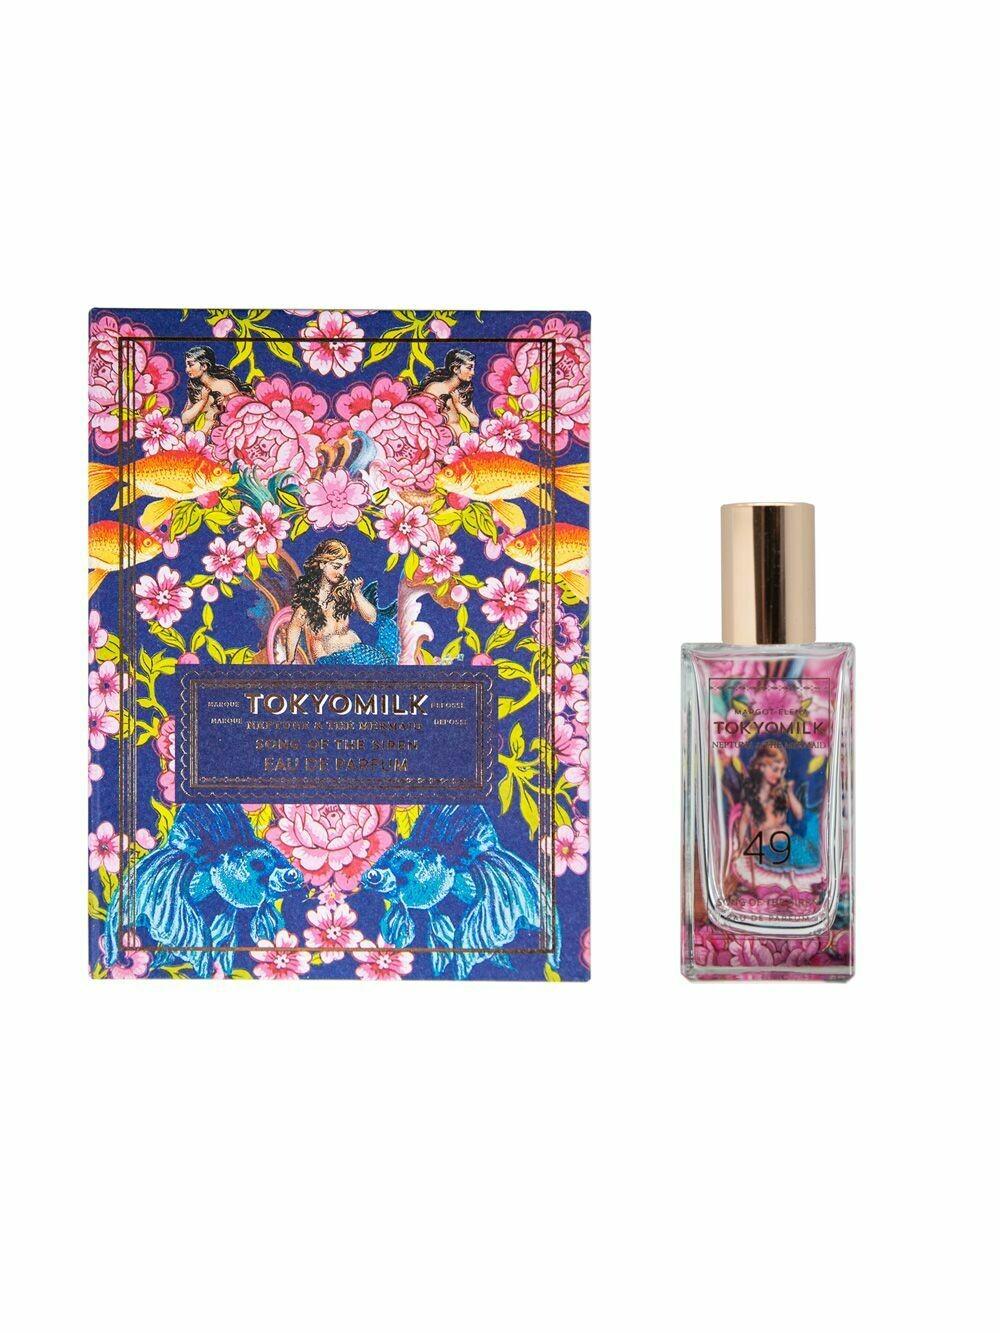 Song of the Siren Perfume - Tokyo Milk Neptune + the Mermaid